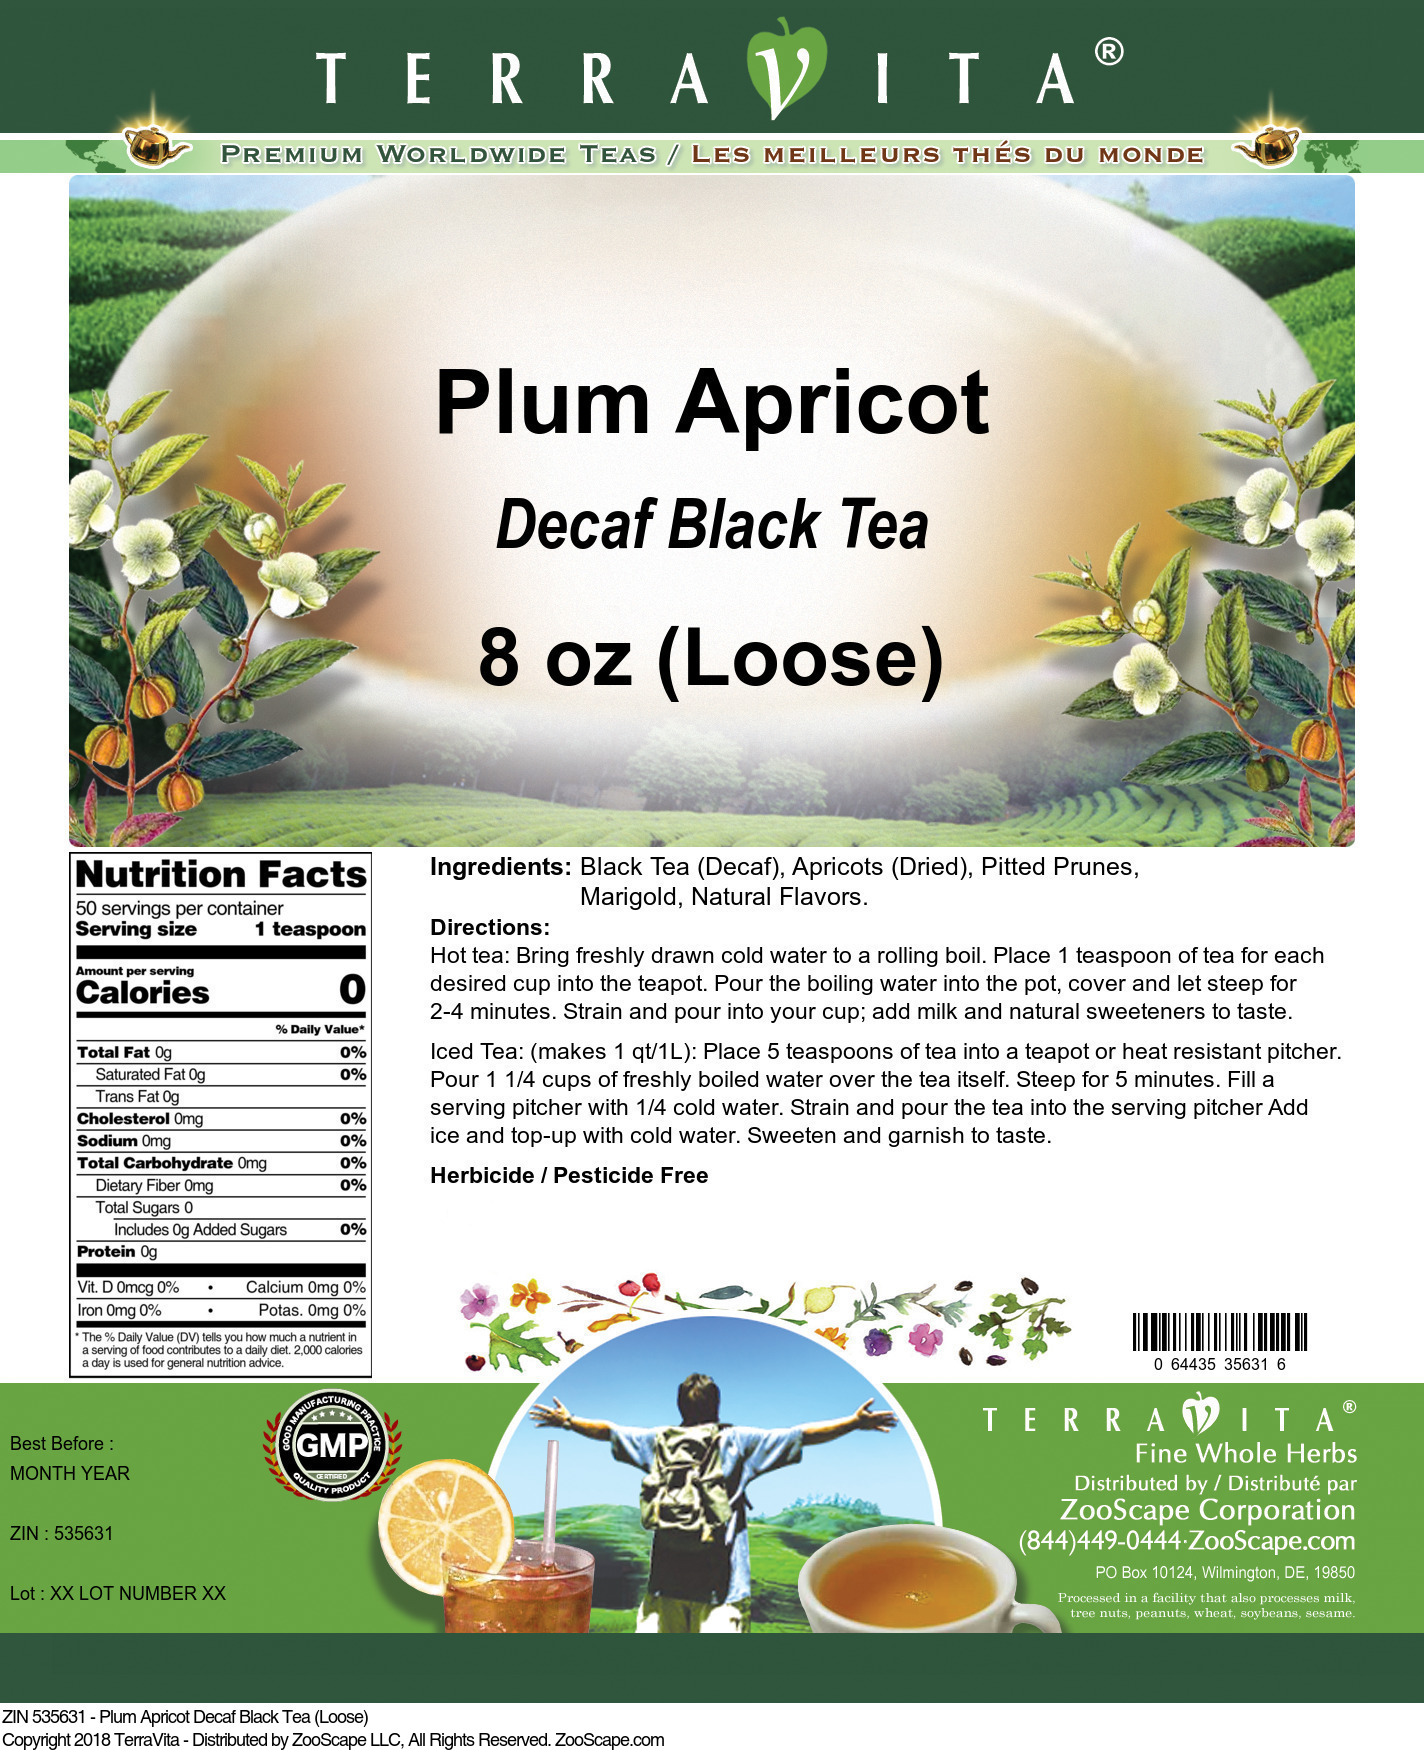 Plum Apricot Decaf Black Tea